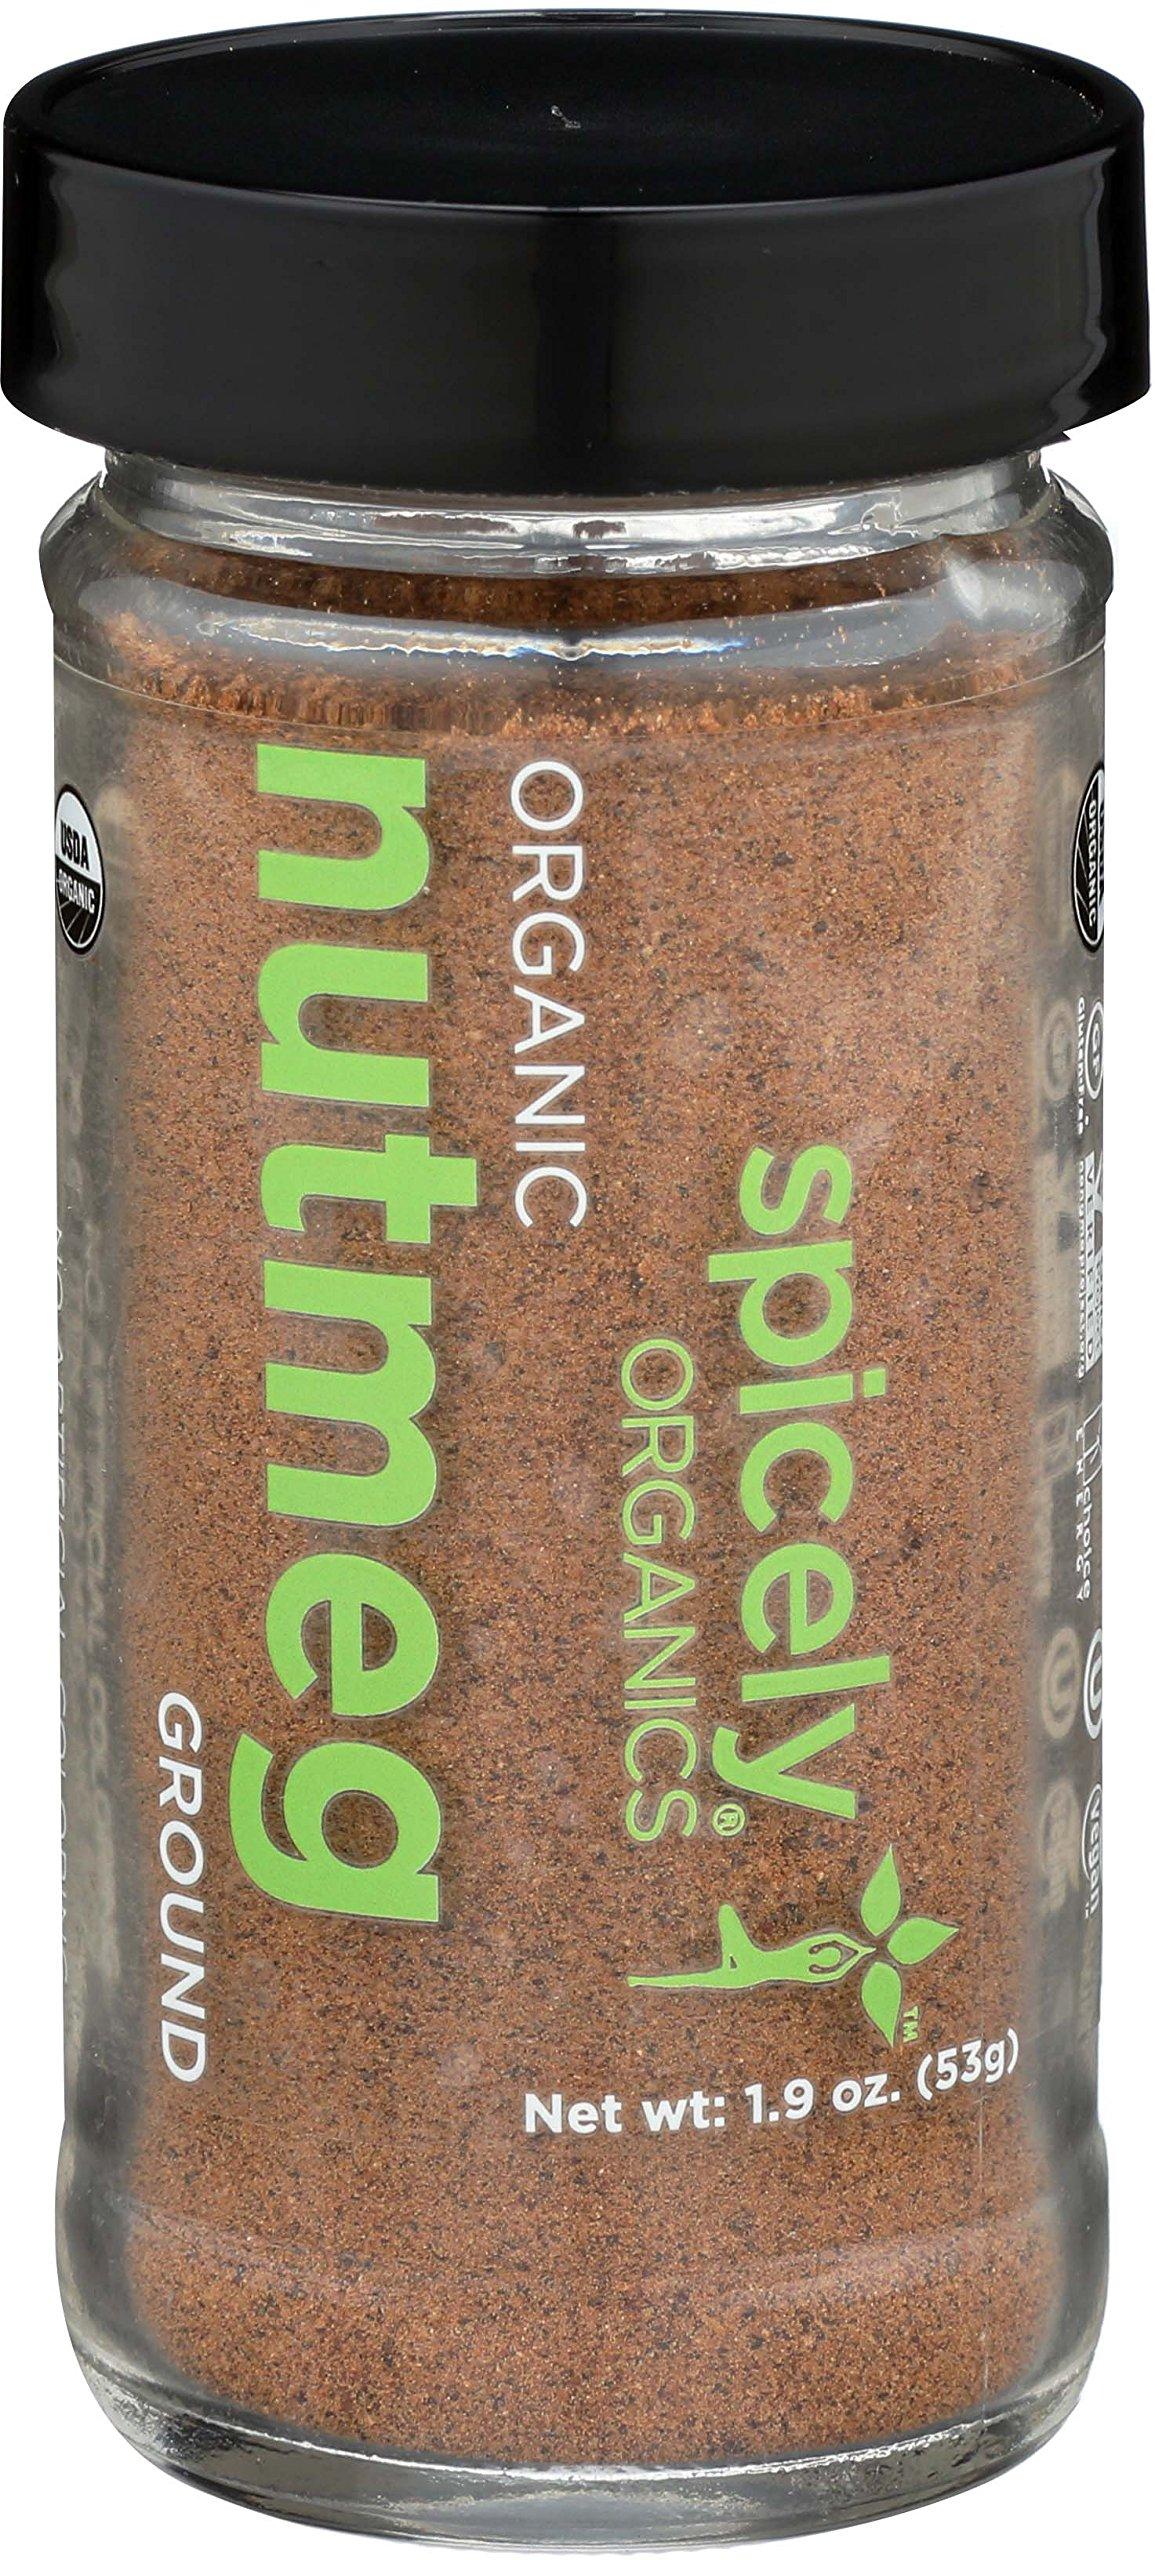 SPICELY Jar Organic Nutmeg Ground, 1.9 OZ